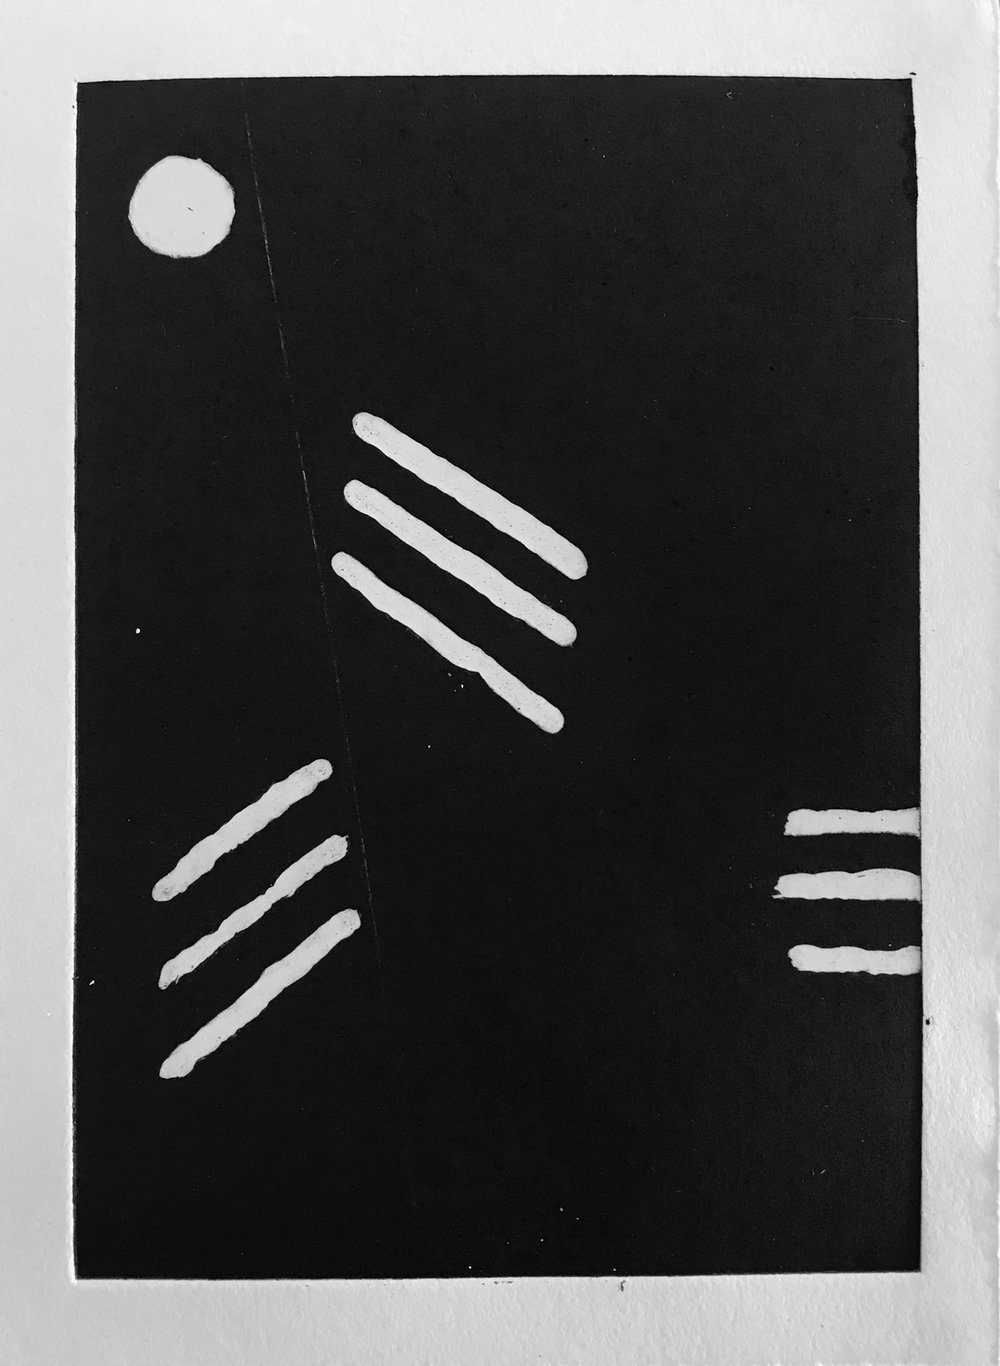 Etching, 16 x 8 cm